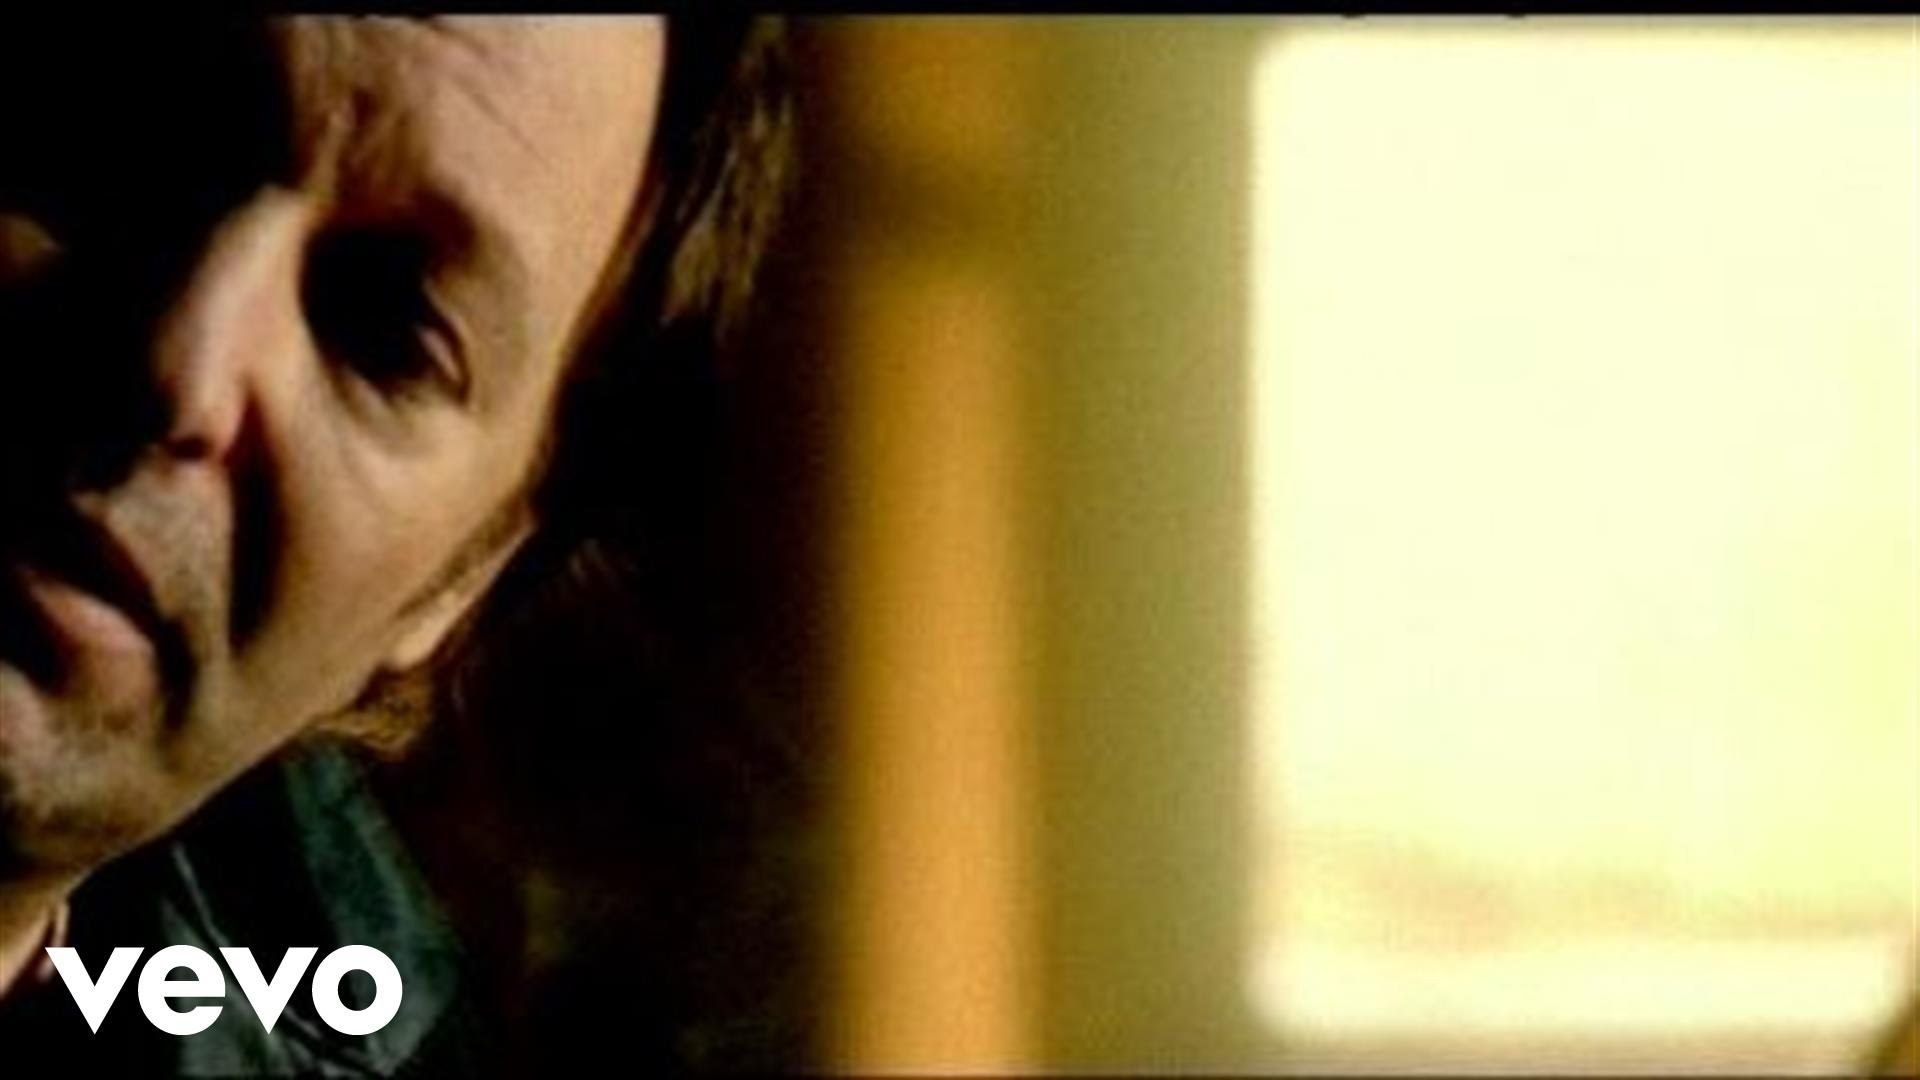 Vasco Rossi - Siamo Soli hé le soir c'est super ecoute tu verras